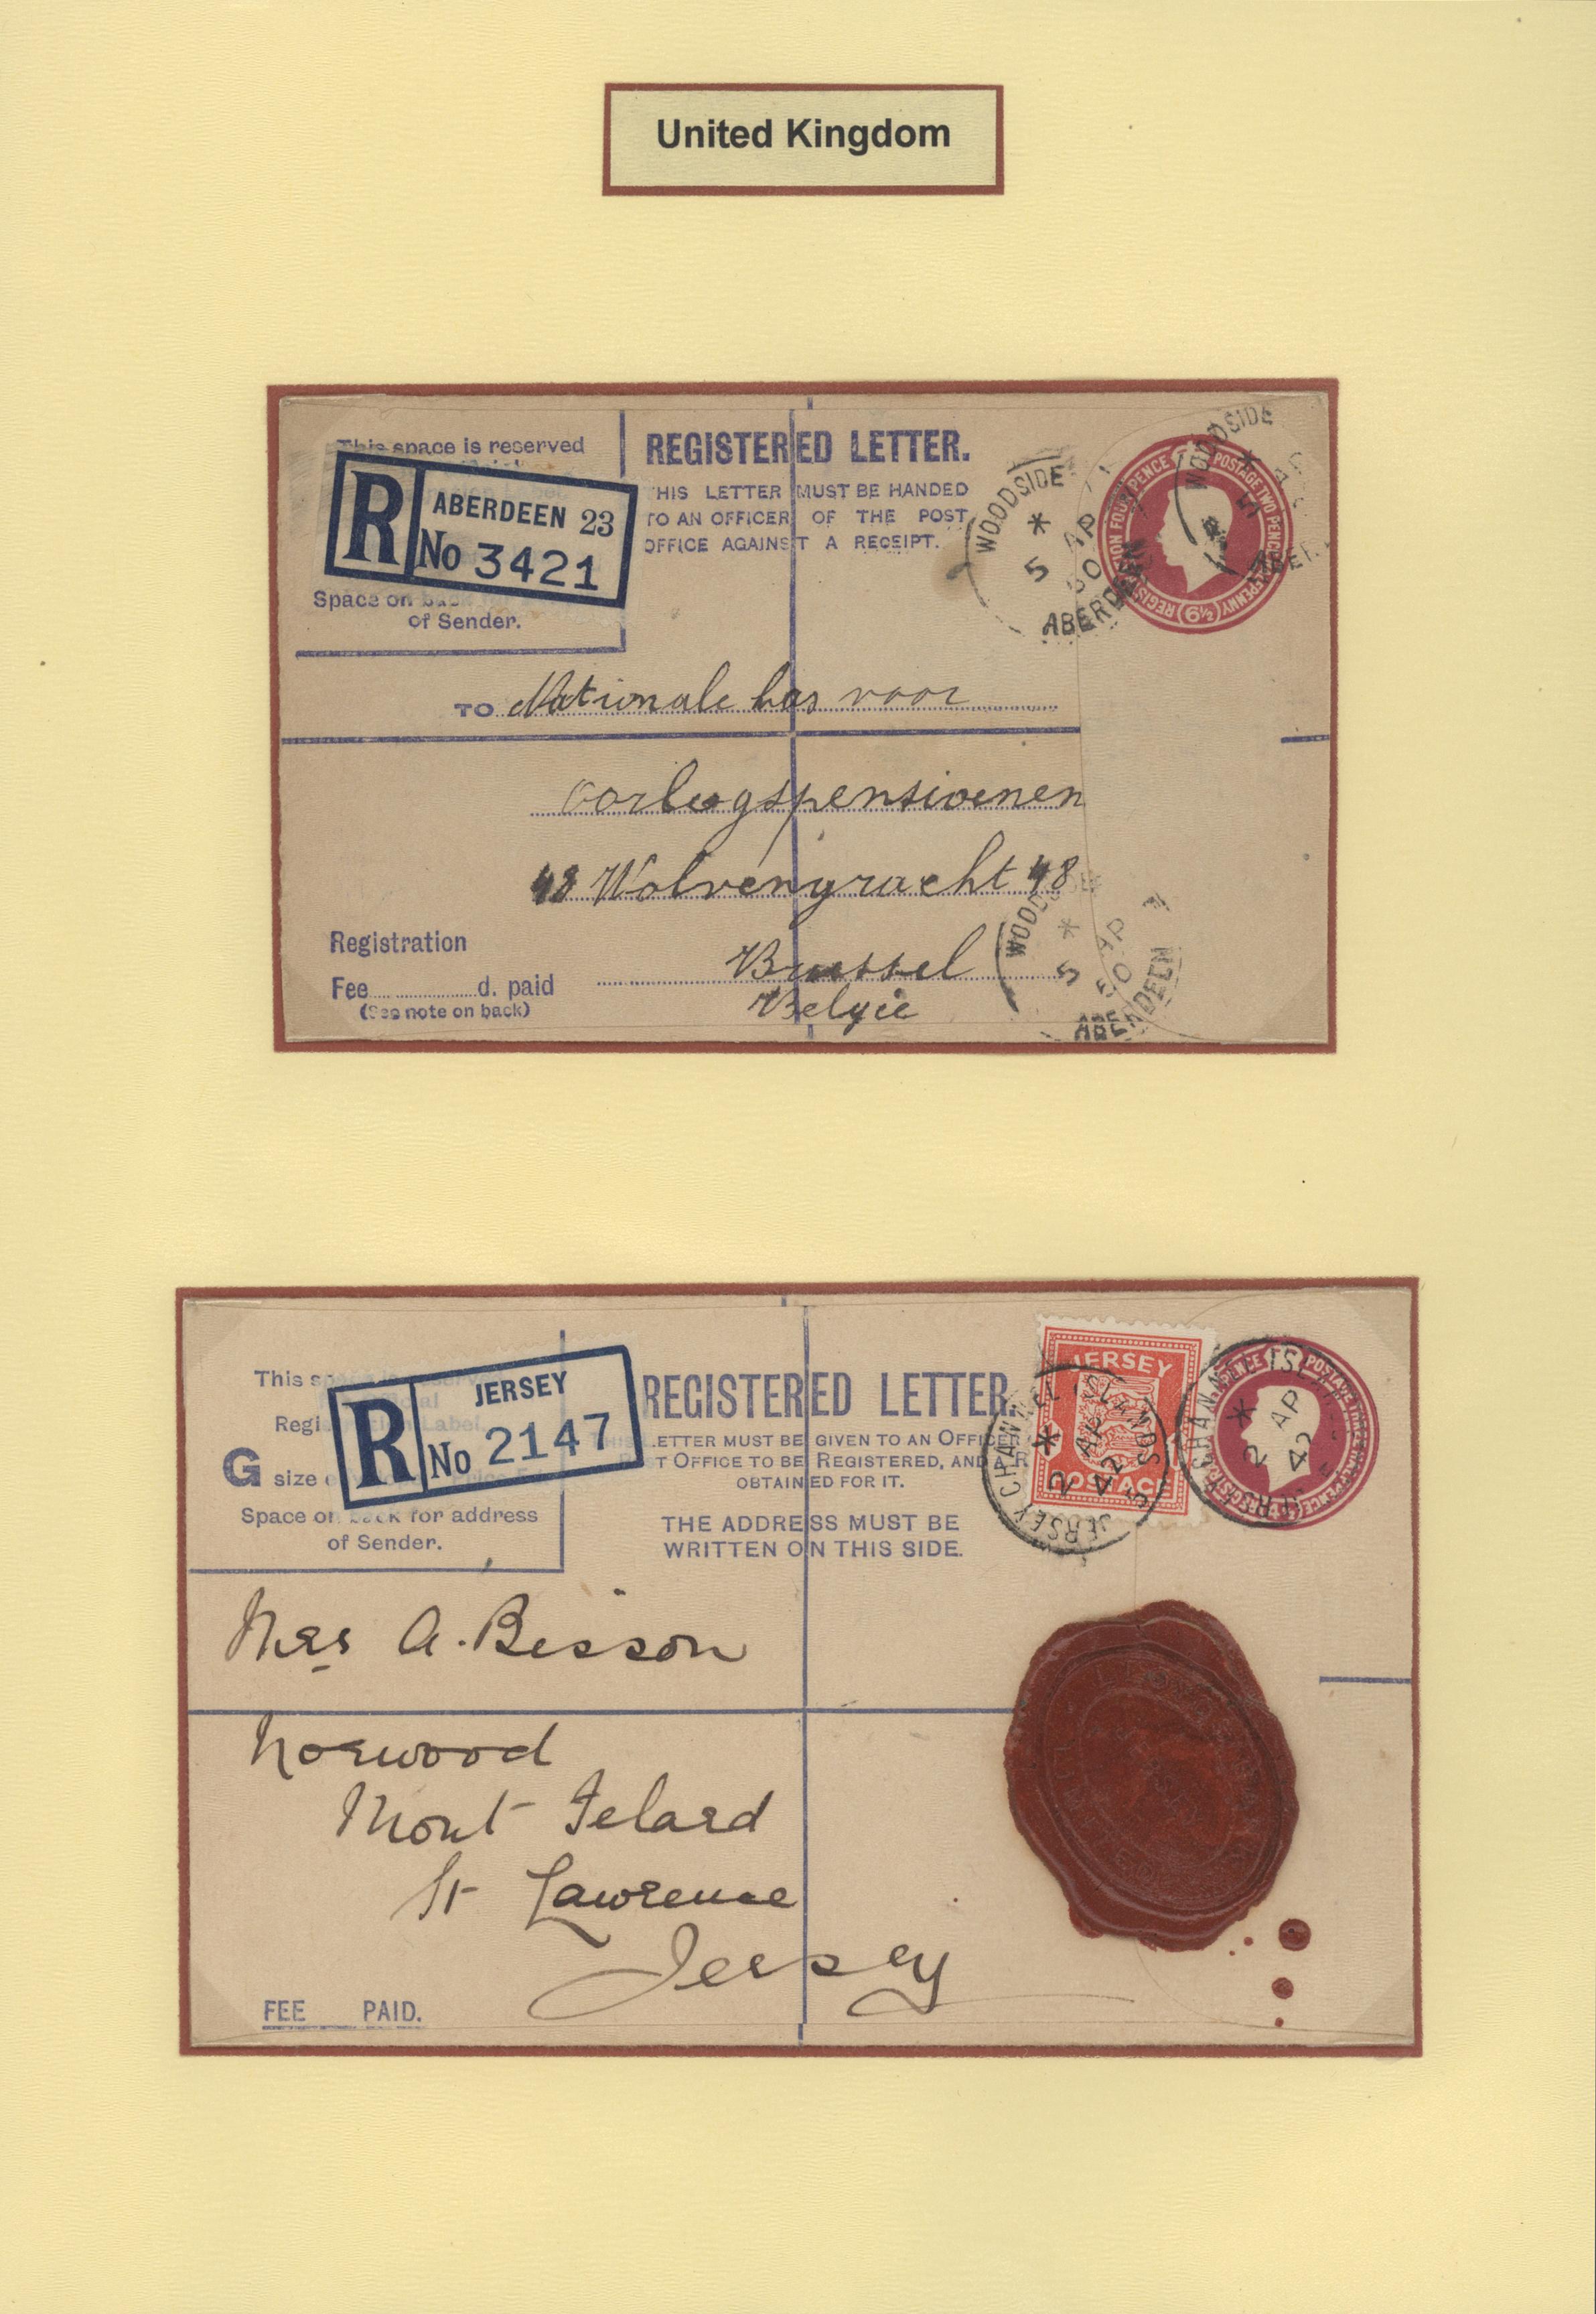 Lot 34783 - Großbritannien - Ganzsachen  -  Auktionshaus Christoph Gärtner GmbH & Co. KG Collections Germany,  Collections Supplement, Surprise boxes #39 Day 7